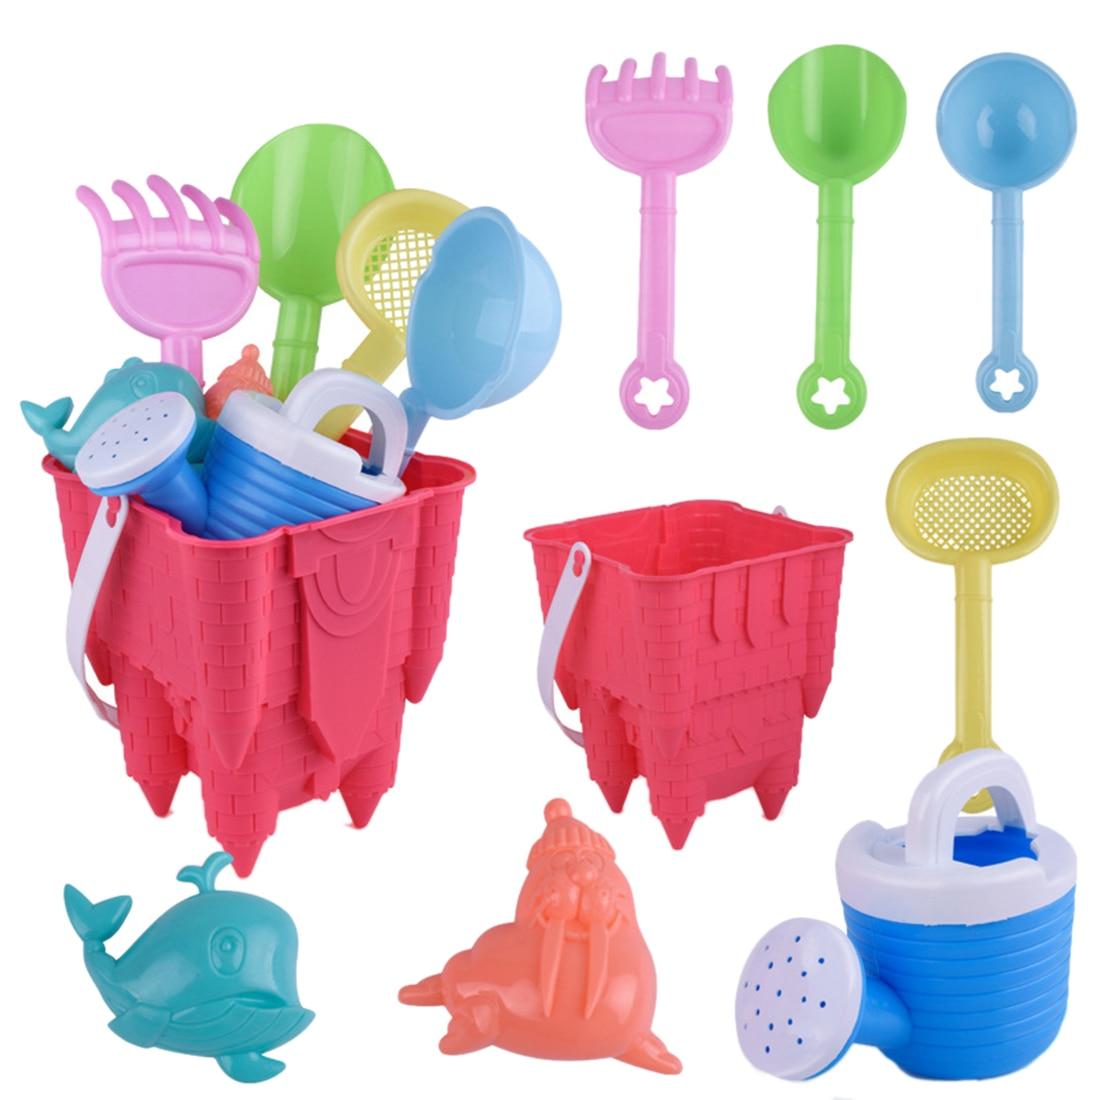 8Pcs Children Outdoor Beach Sand Toy Baby Beach Game Bucket Playset For Kids Water Fun Beach Toy Set- Color Random